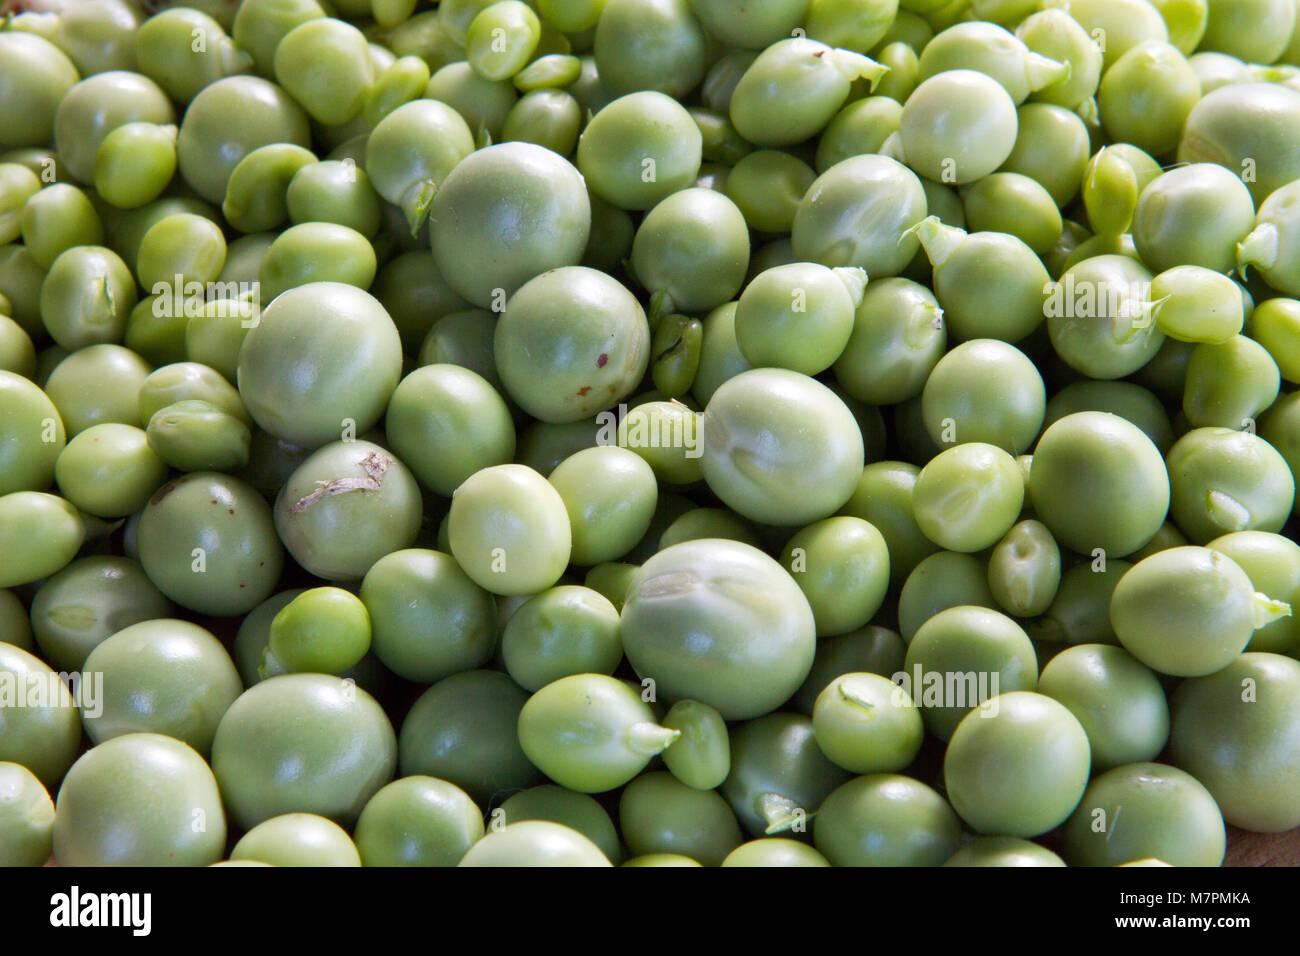 Fresh green peas organic Bio vegetable, raw macro vegetables object.. - Stock Image